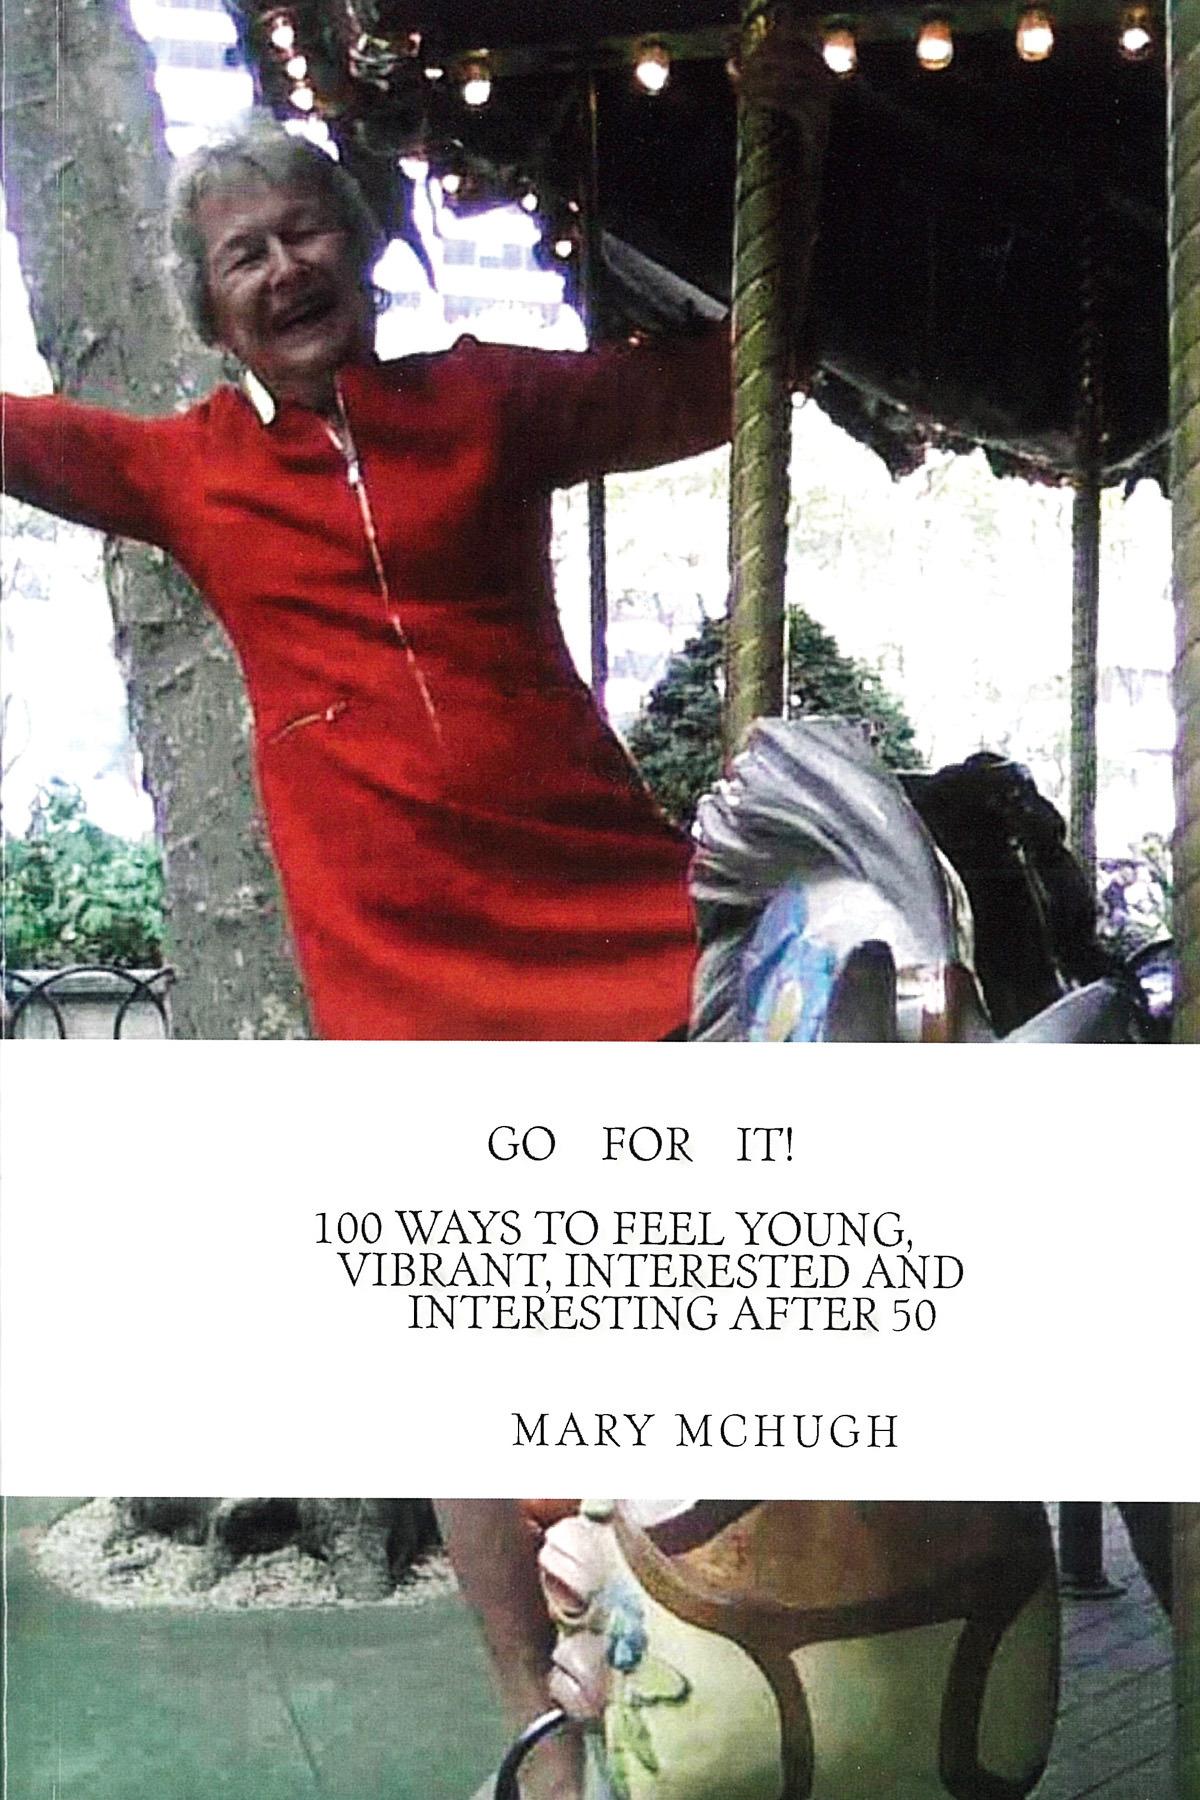 aa0e7421d6a45d8842a8_Mary_McHugh_Book_Cover.jpg